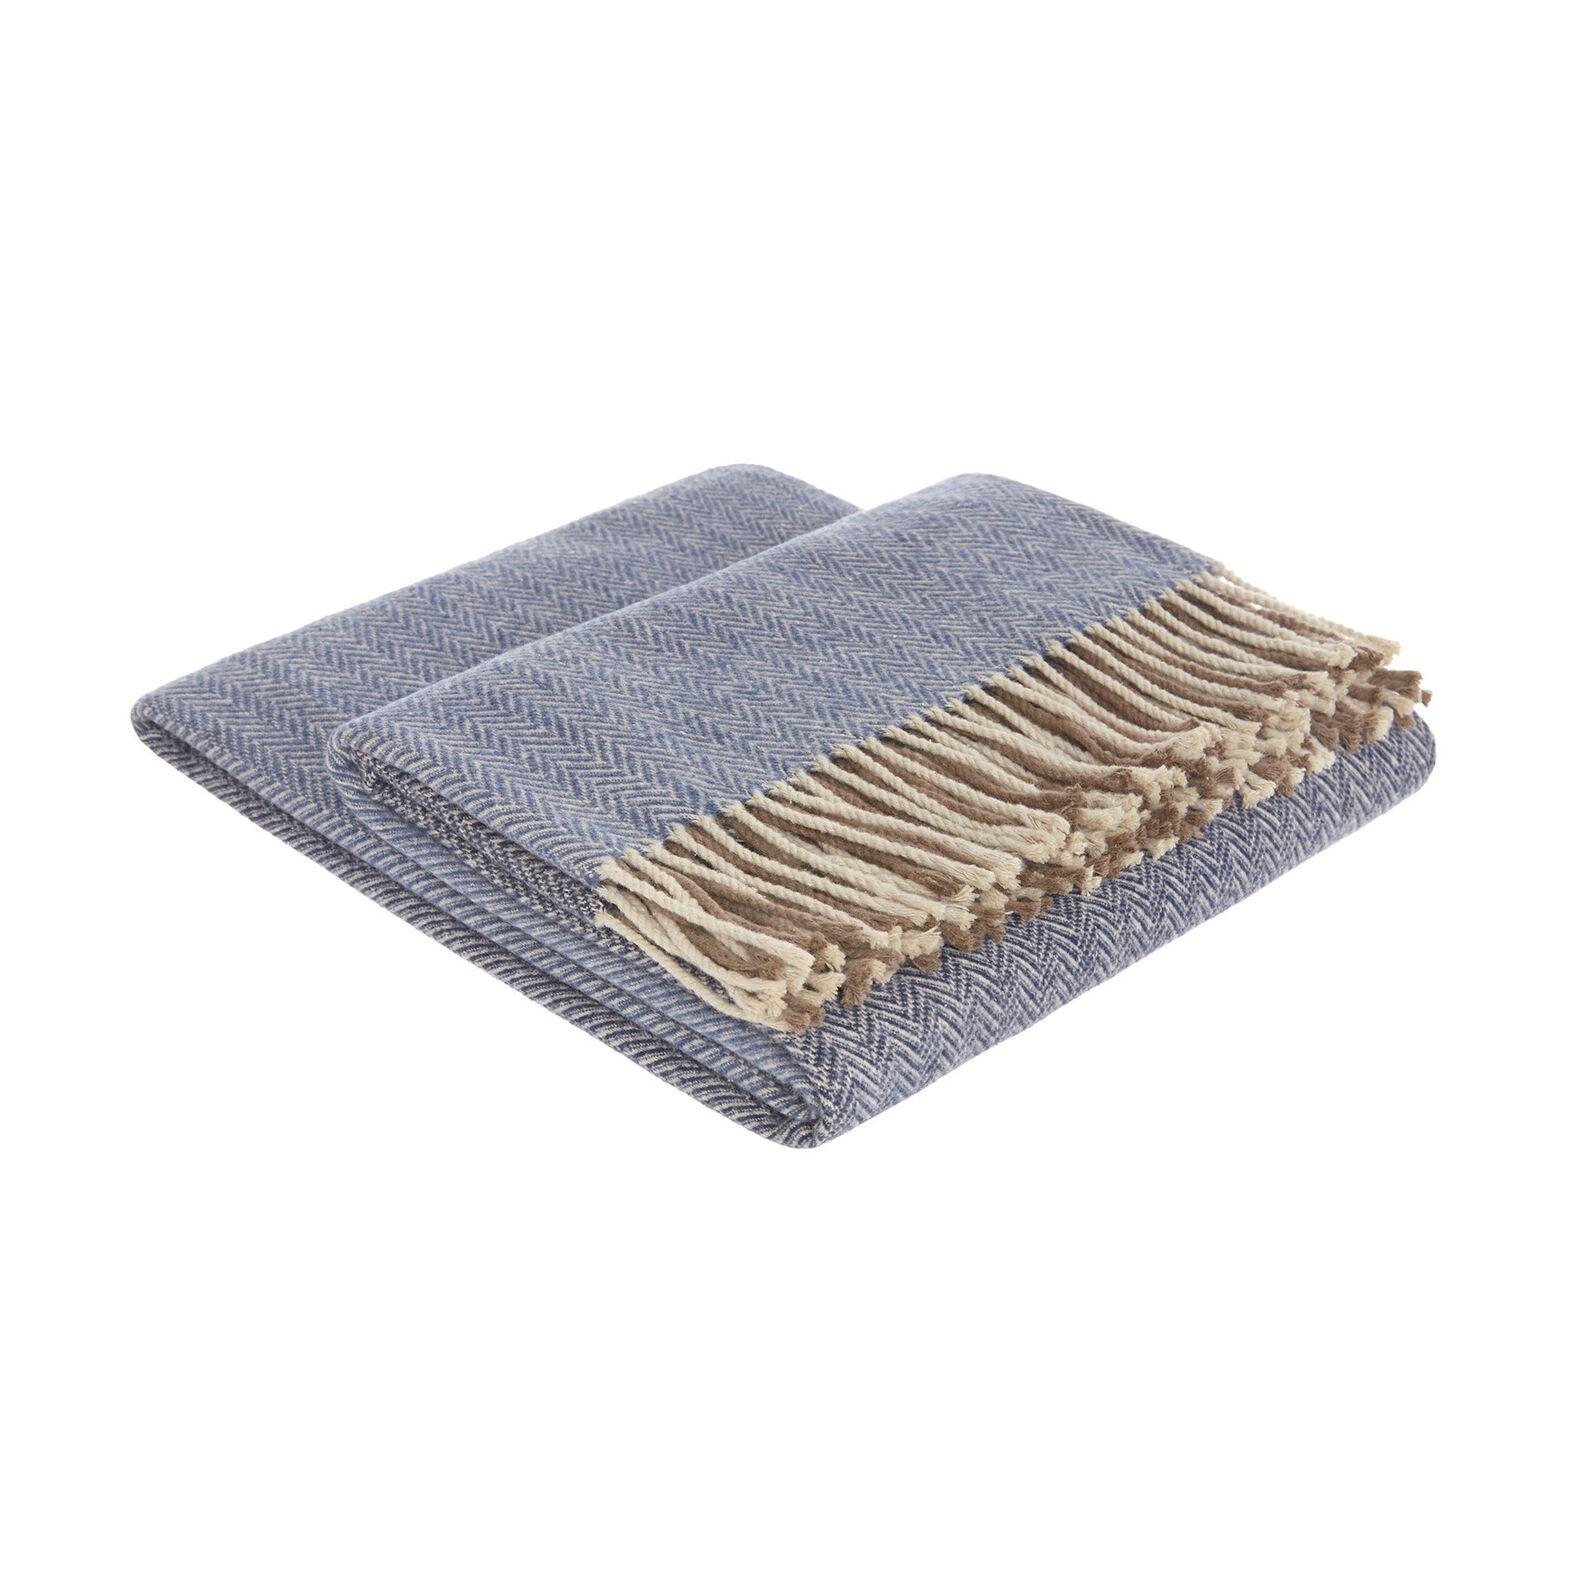 Cotton plaid with fishbone pattern